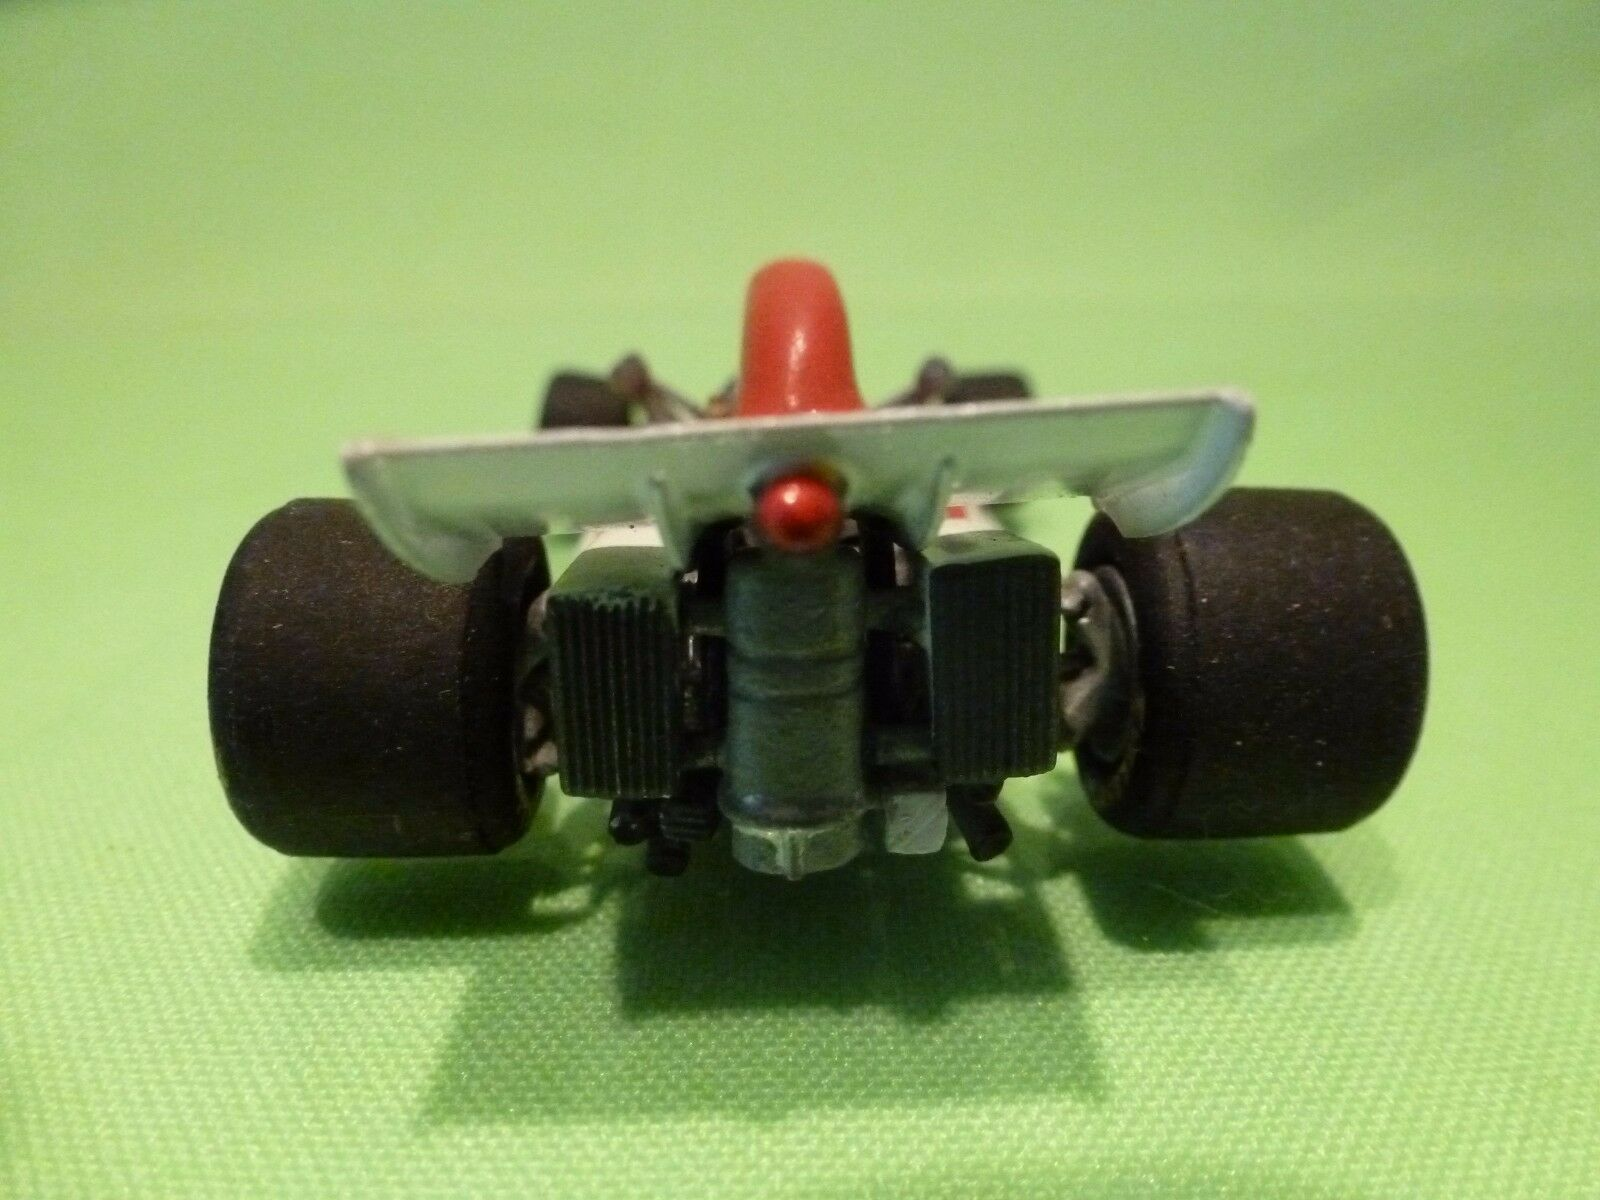 SRC MODELS MODELS MODELS KIT (built) - BRM P160M - MARLBgold HEUER - F1 1 43 - NICE CONDITION b73fbf